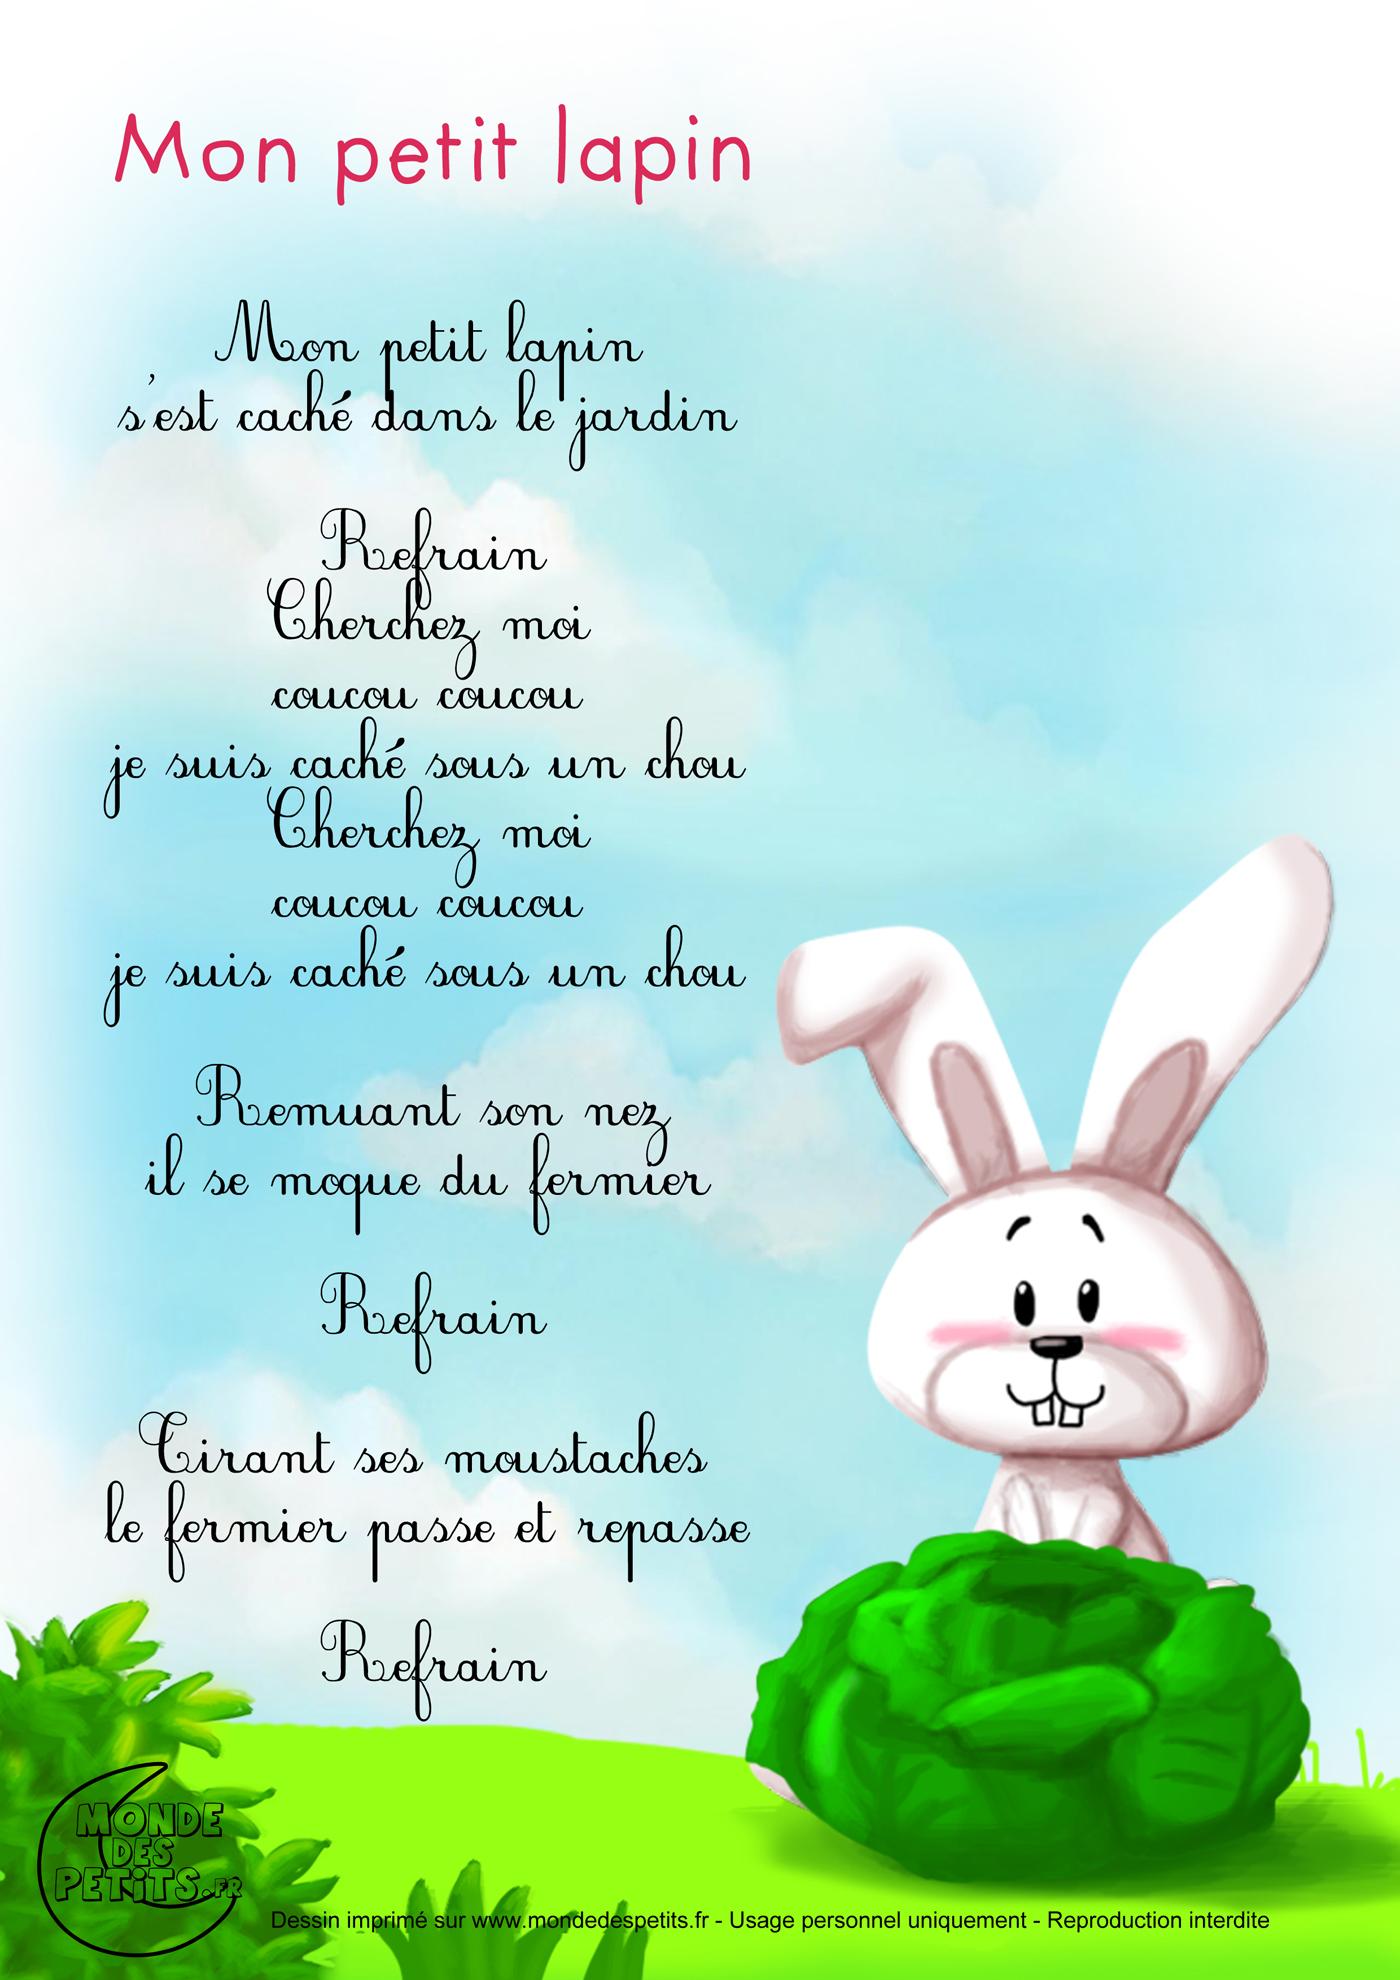 Monde des petits Mon petit lapin